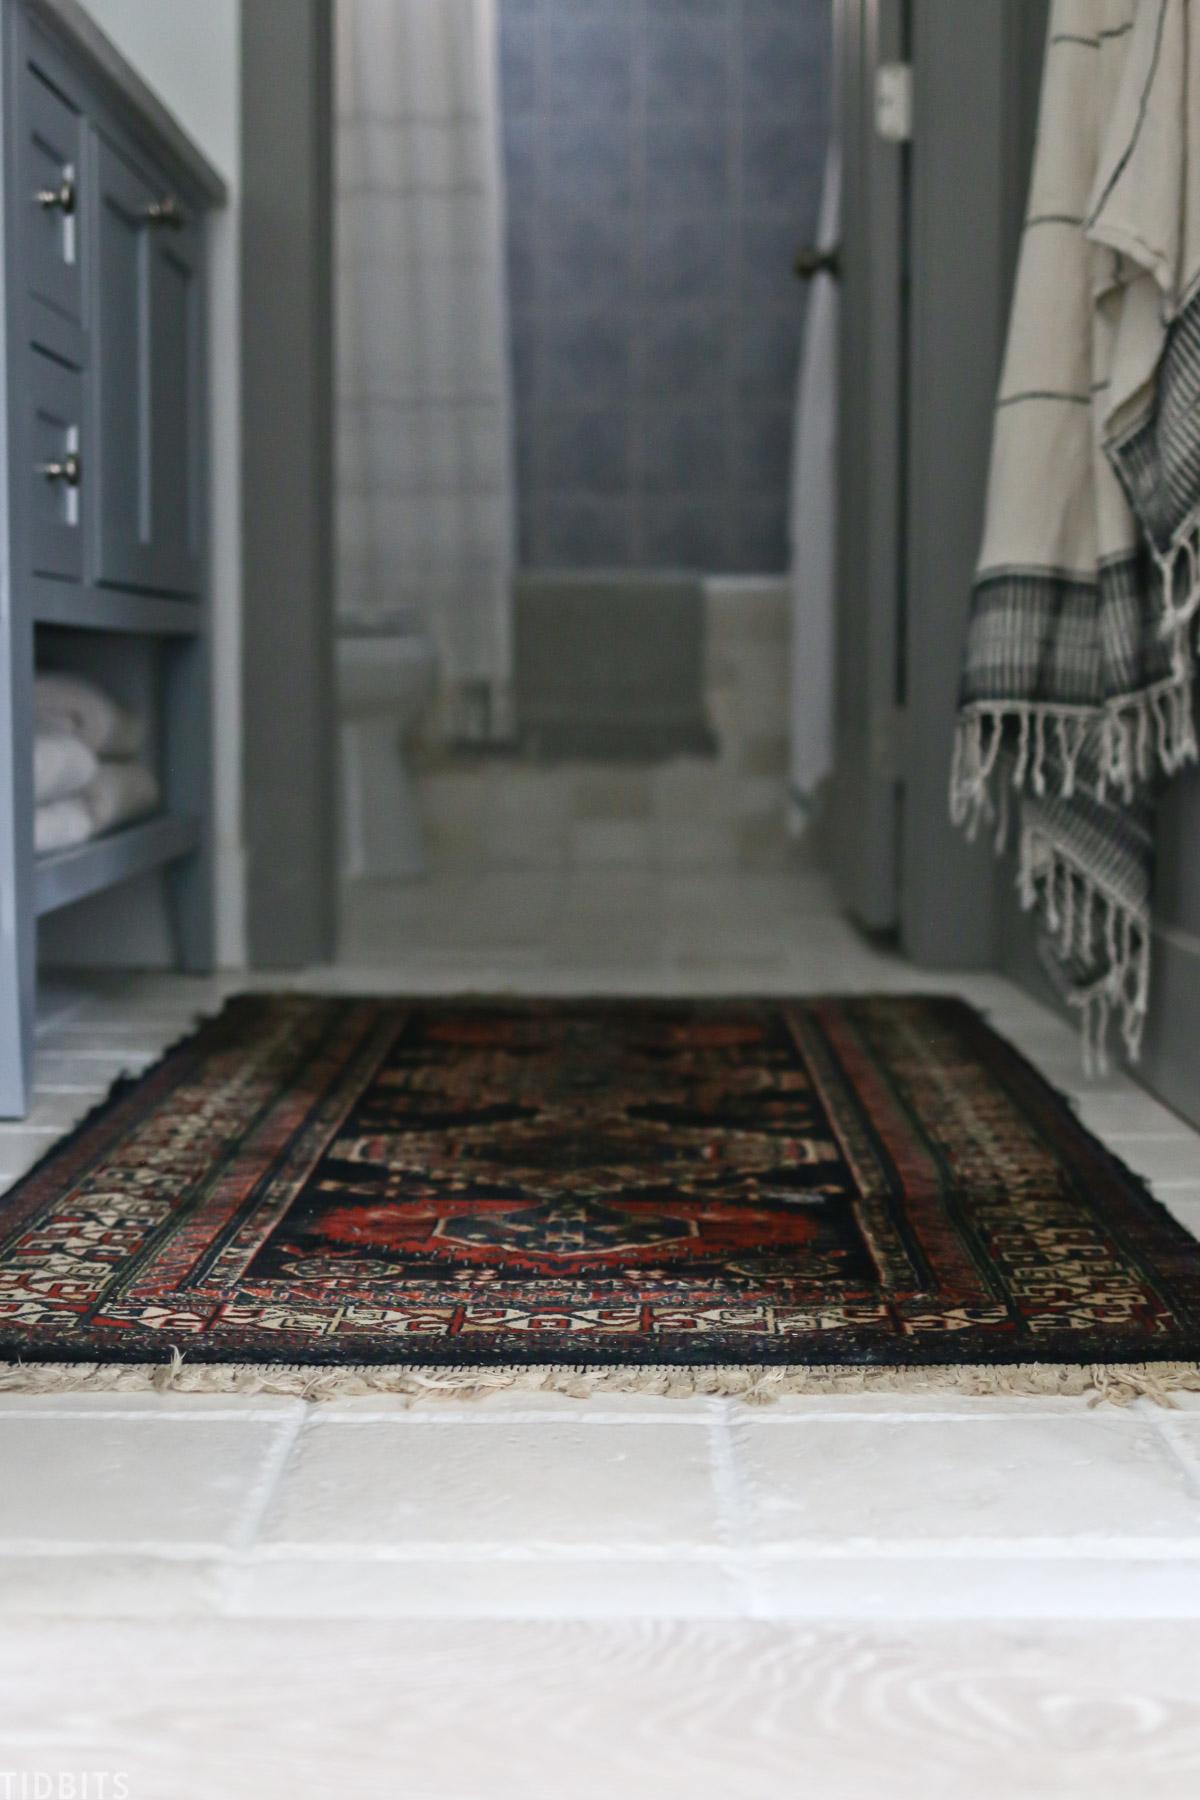 antique rug placed on floor in split bathroom